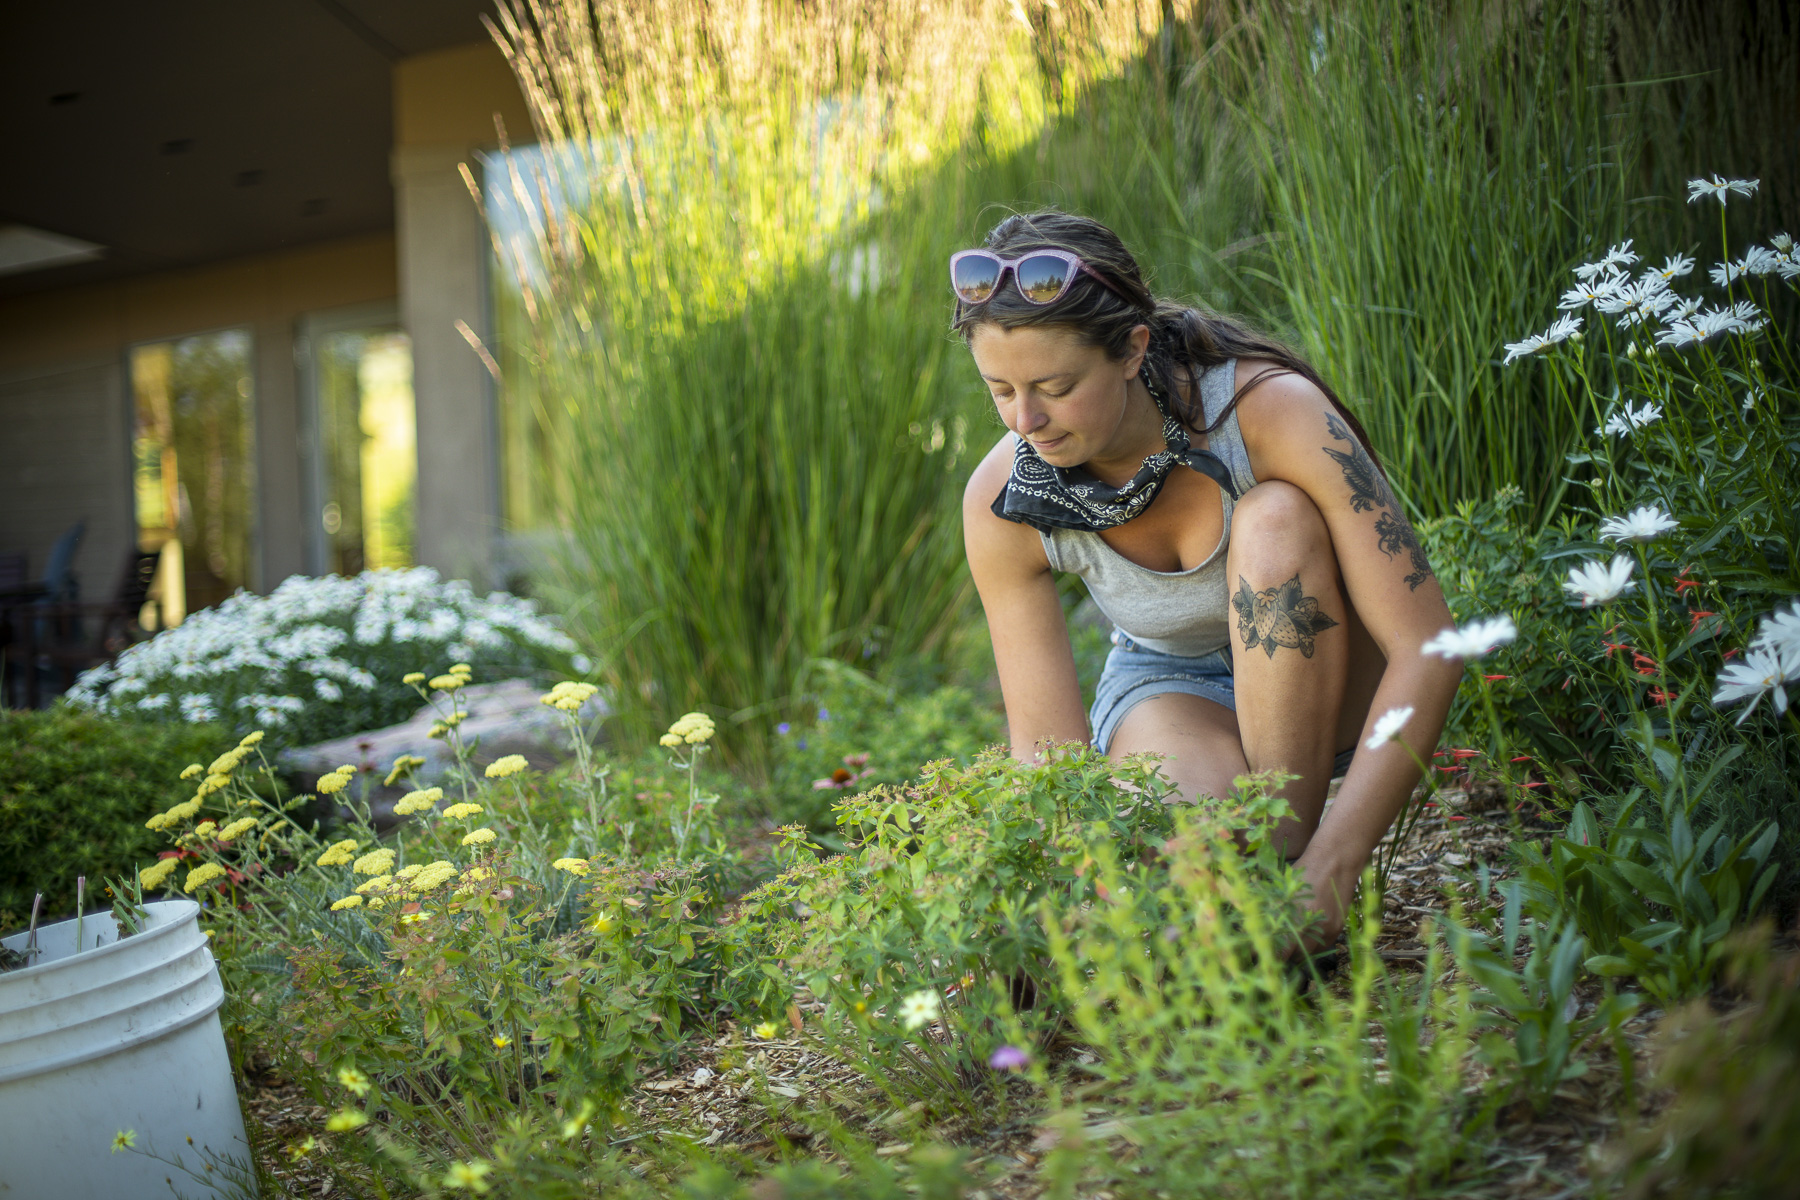 Garden services team providing sustainable maintenance